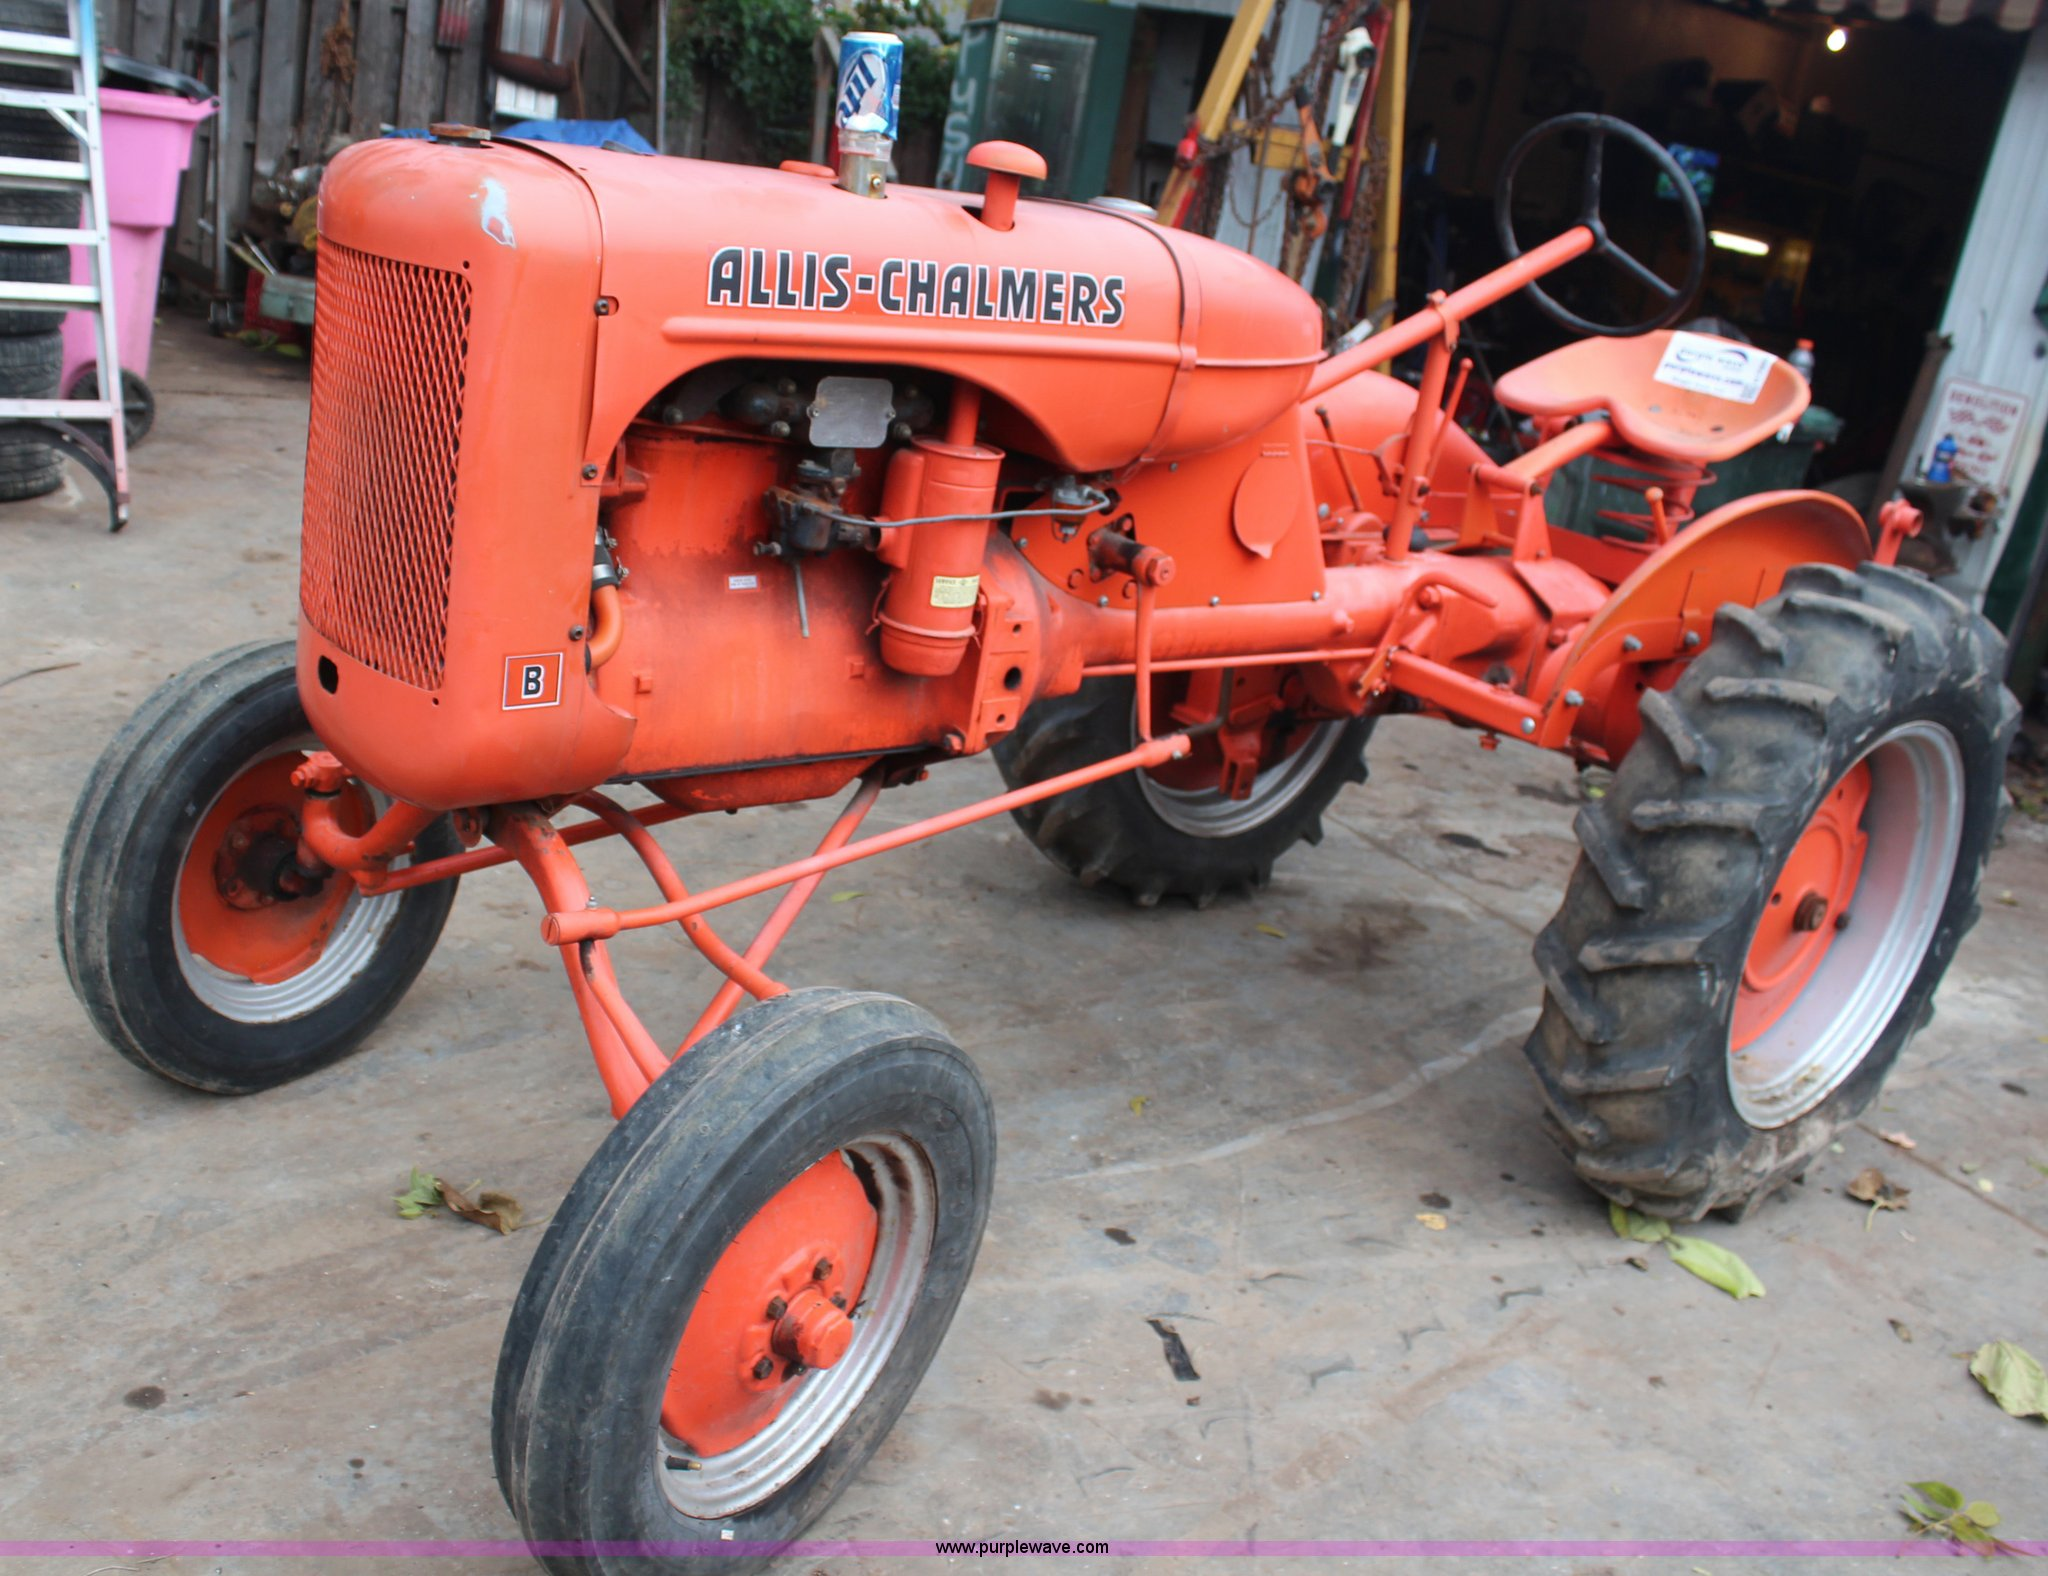 1940 Allis Chalmers B tractor | Item H7950 | 11-20-2013